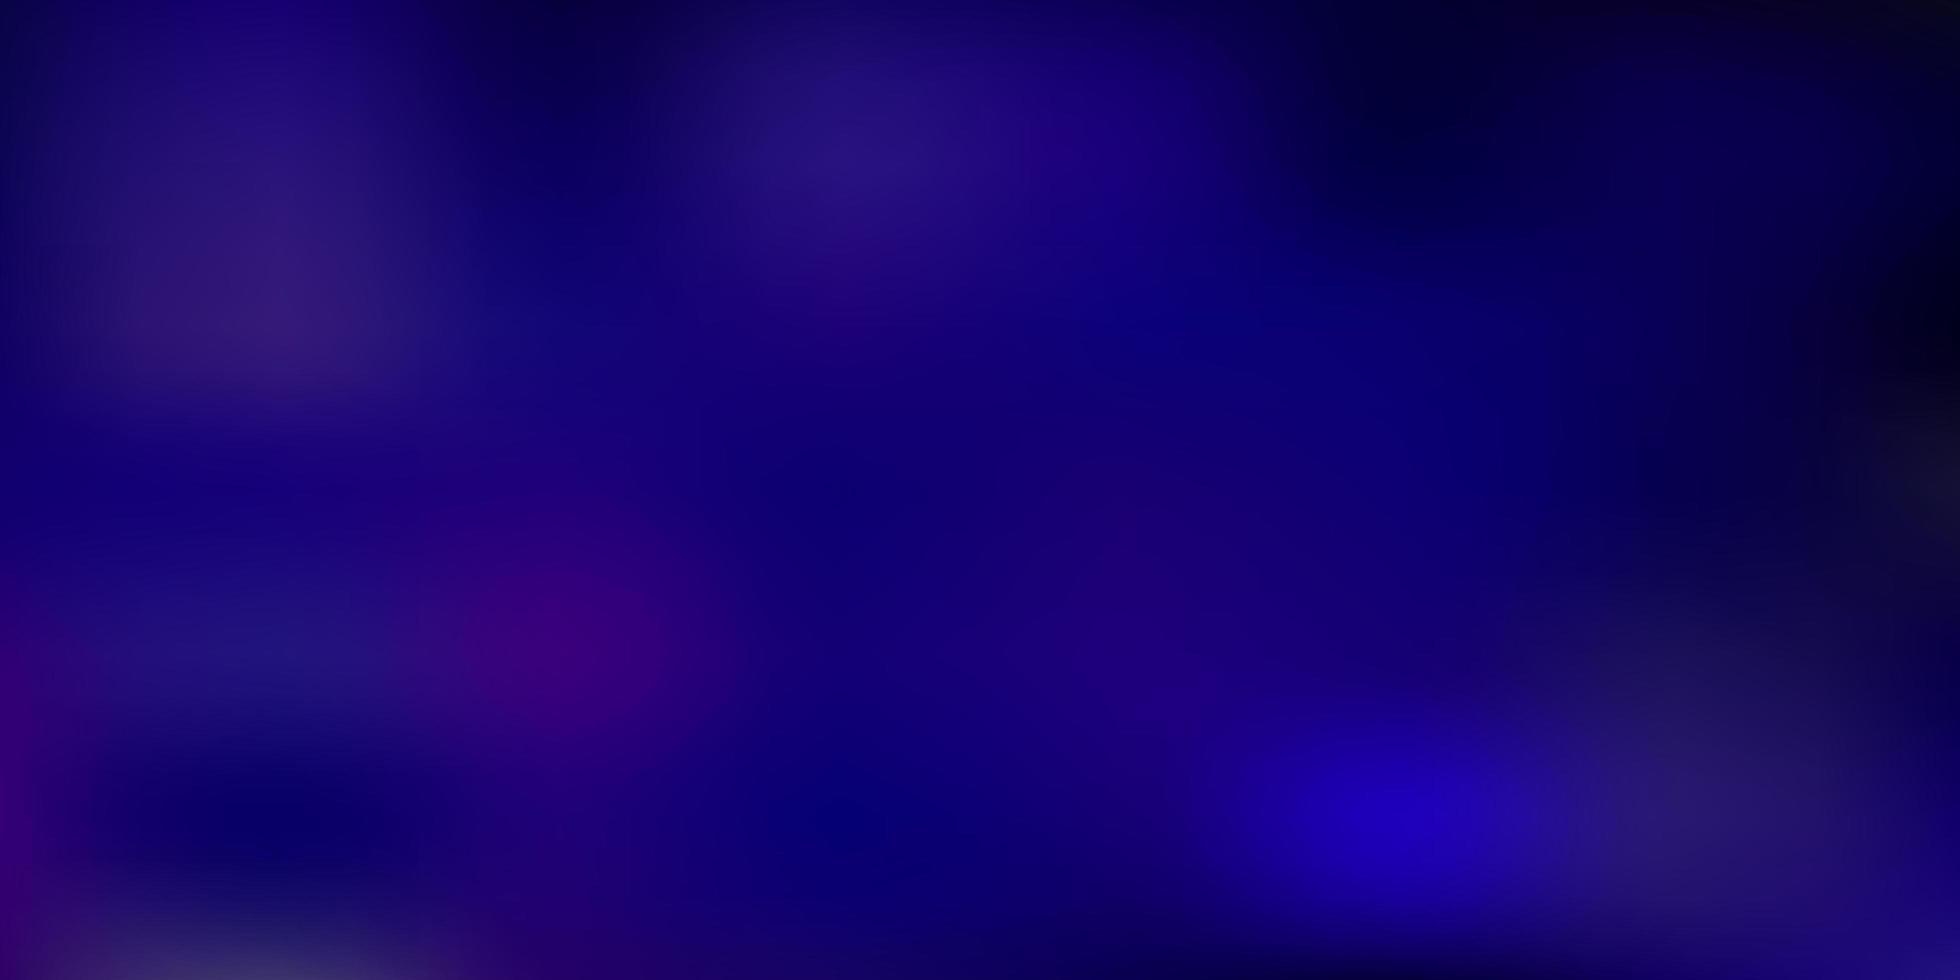 layout de borrão gradiente de vetor roxo claro.